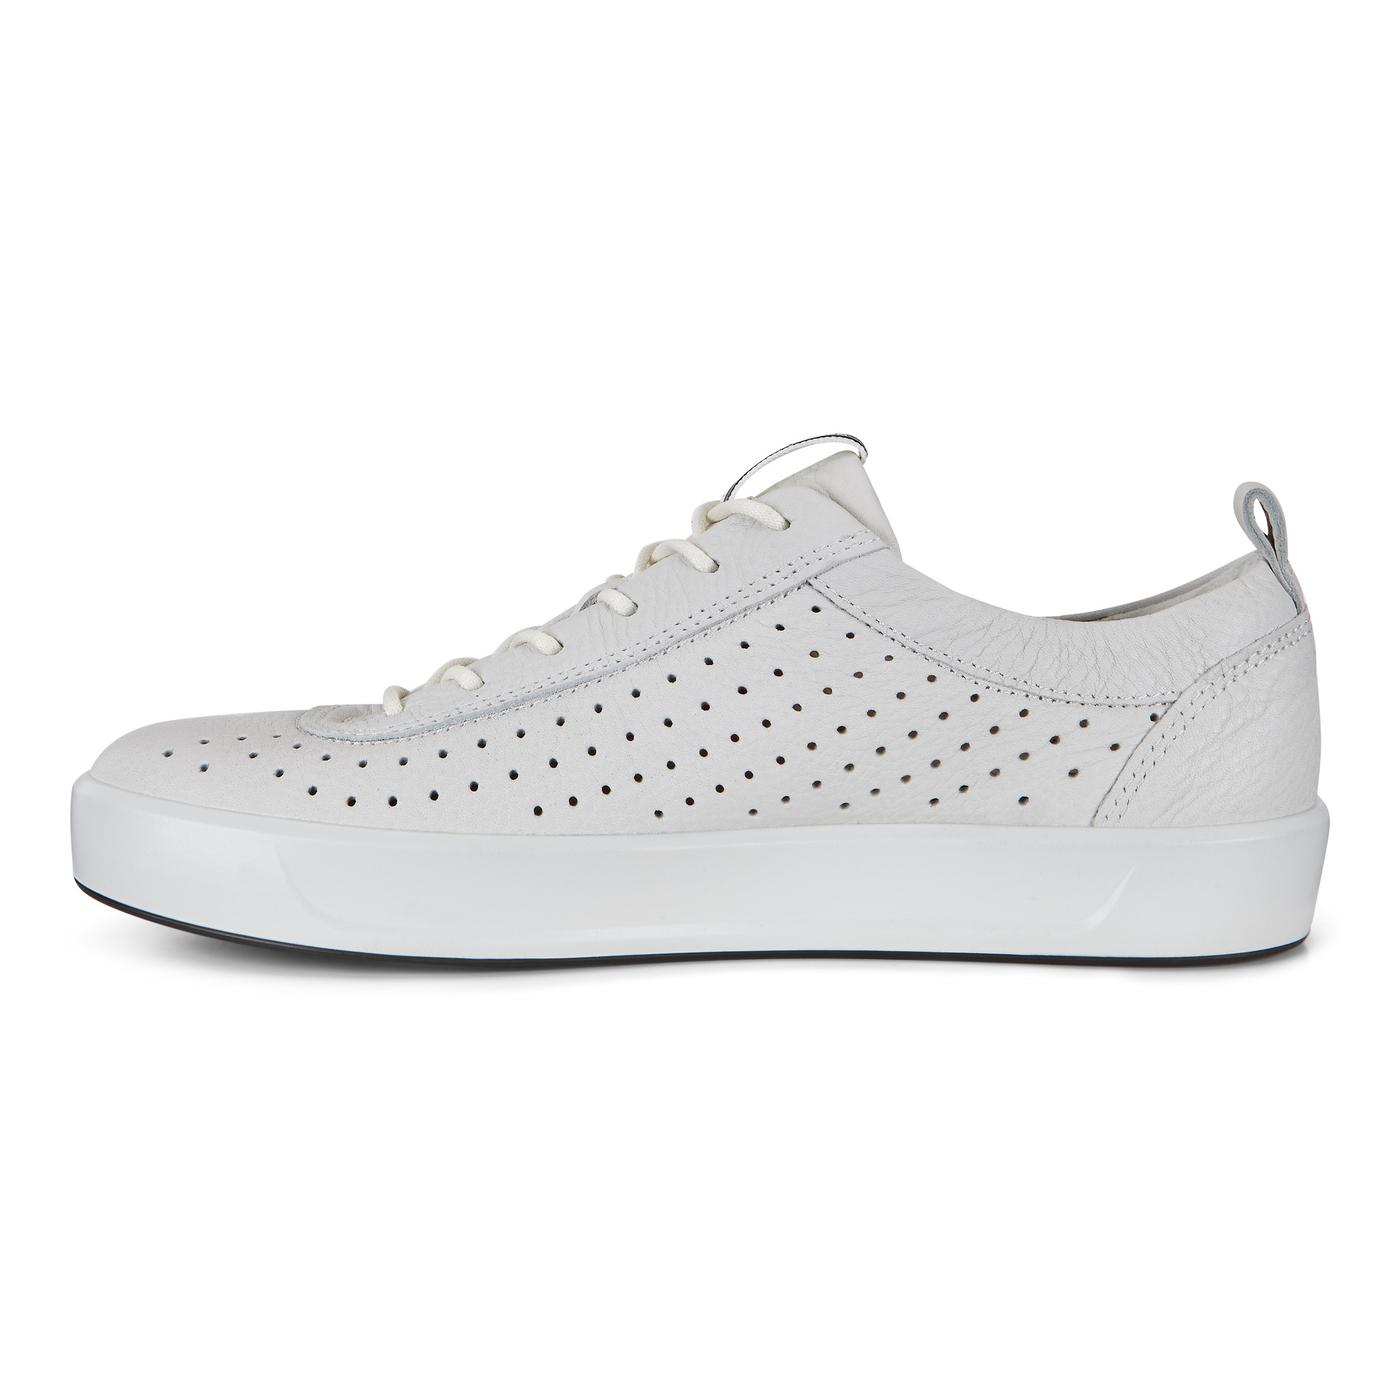 ECCO SOFT8 Ladies Summer Sneaker